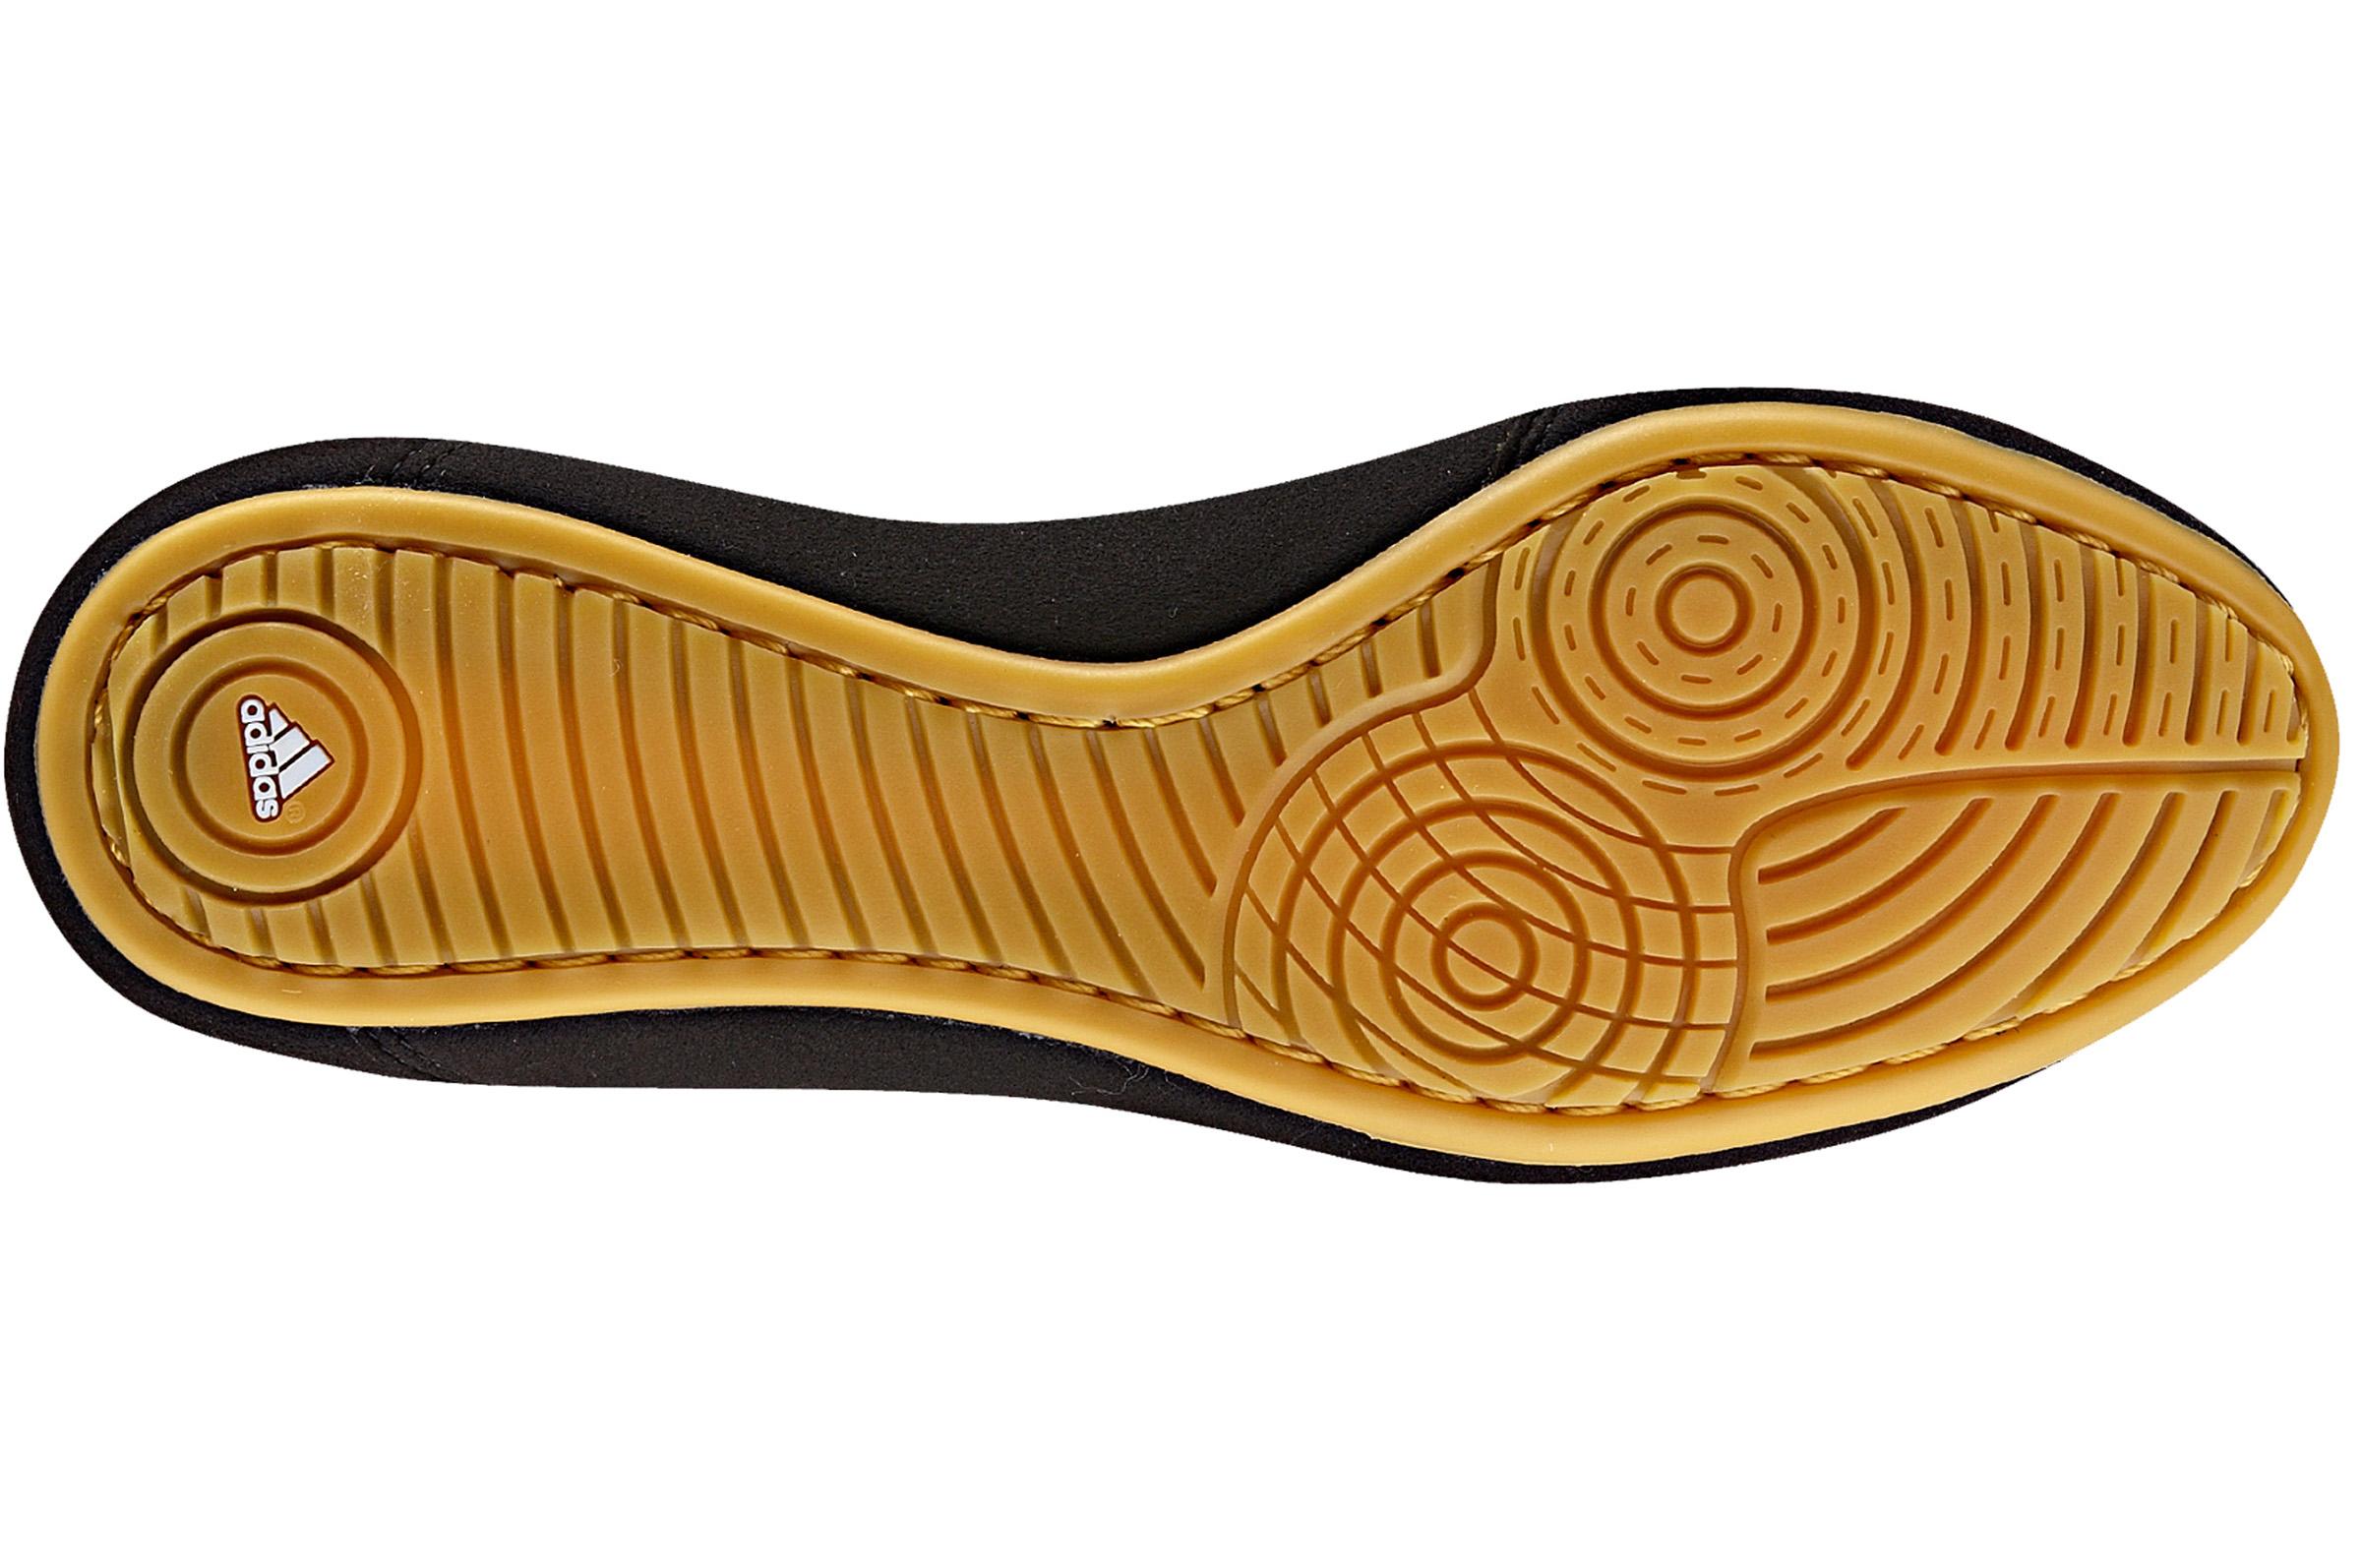 premium selection 5bee3 98a97 HCV Shoes Kids Strap, Adidas Q33838,